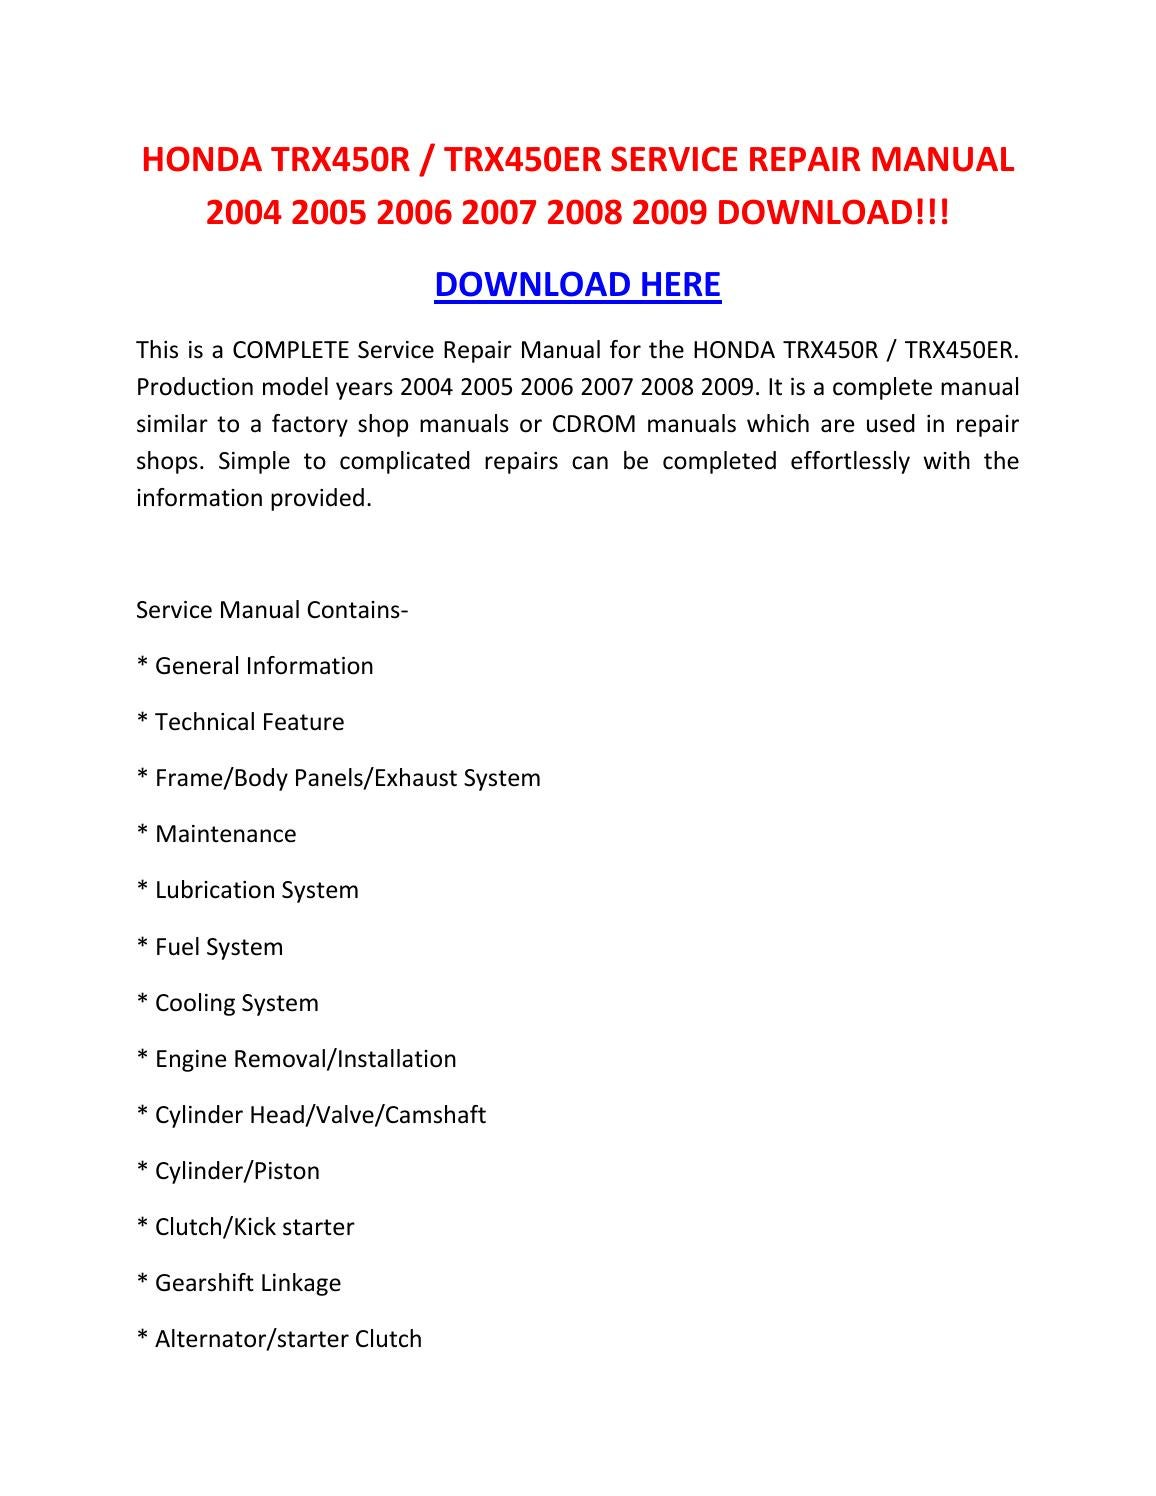 honda trx450r trx450er service repair manual 2004 2005 2006 2007 2008 2009 download    by honda 450r service manual honda 450 r service manual pdf